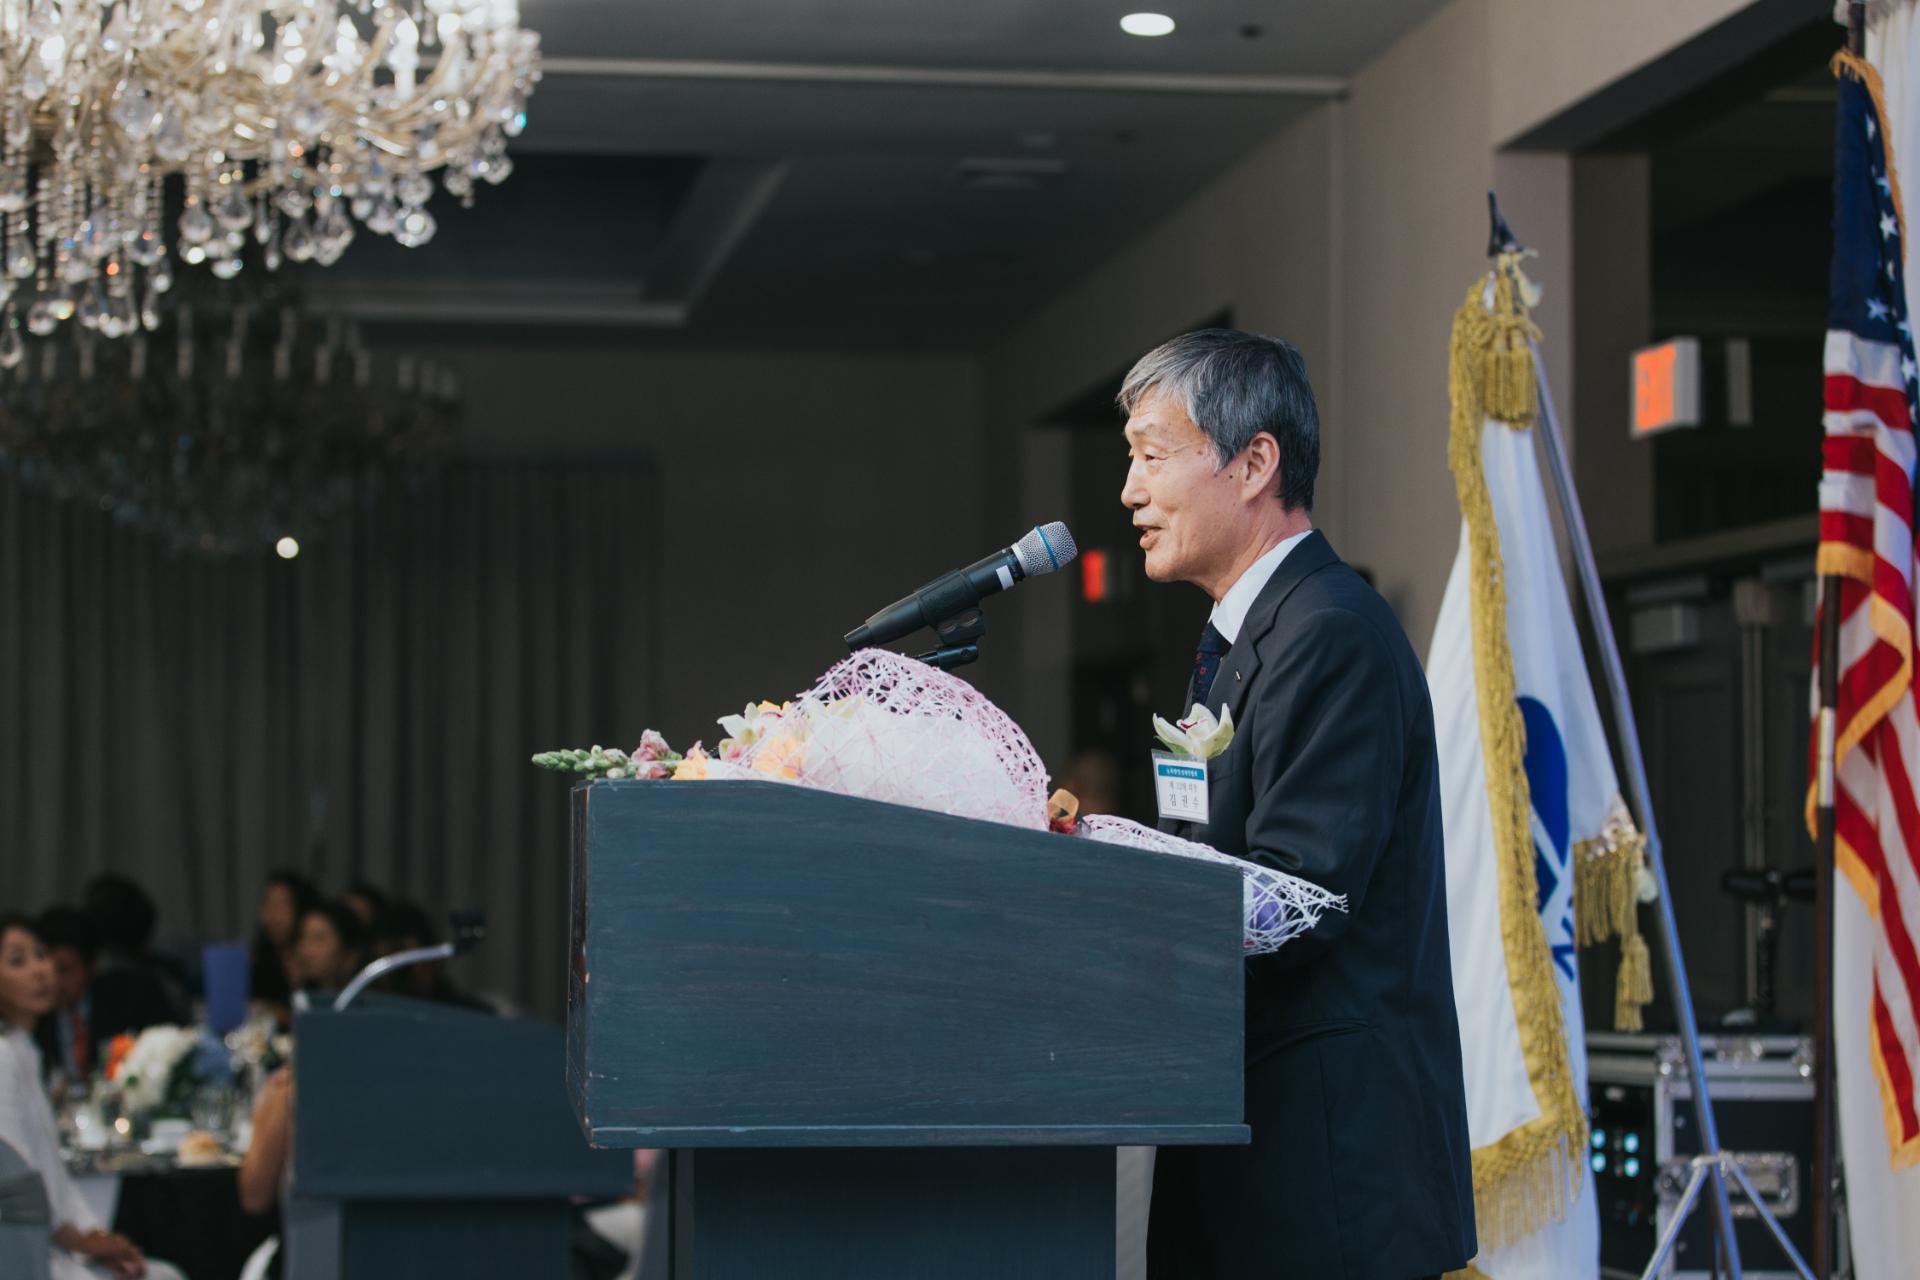 https://nykbi.com/new/wp-content/uploads/2019/07/190607-NYKBI-Inauguration-Ceremony-058-1.jpg